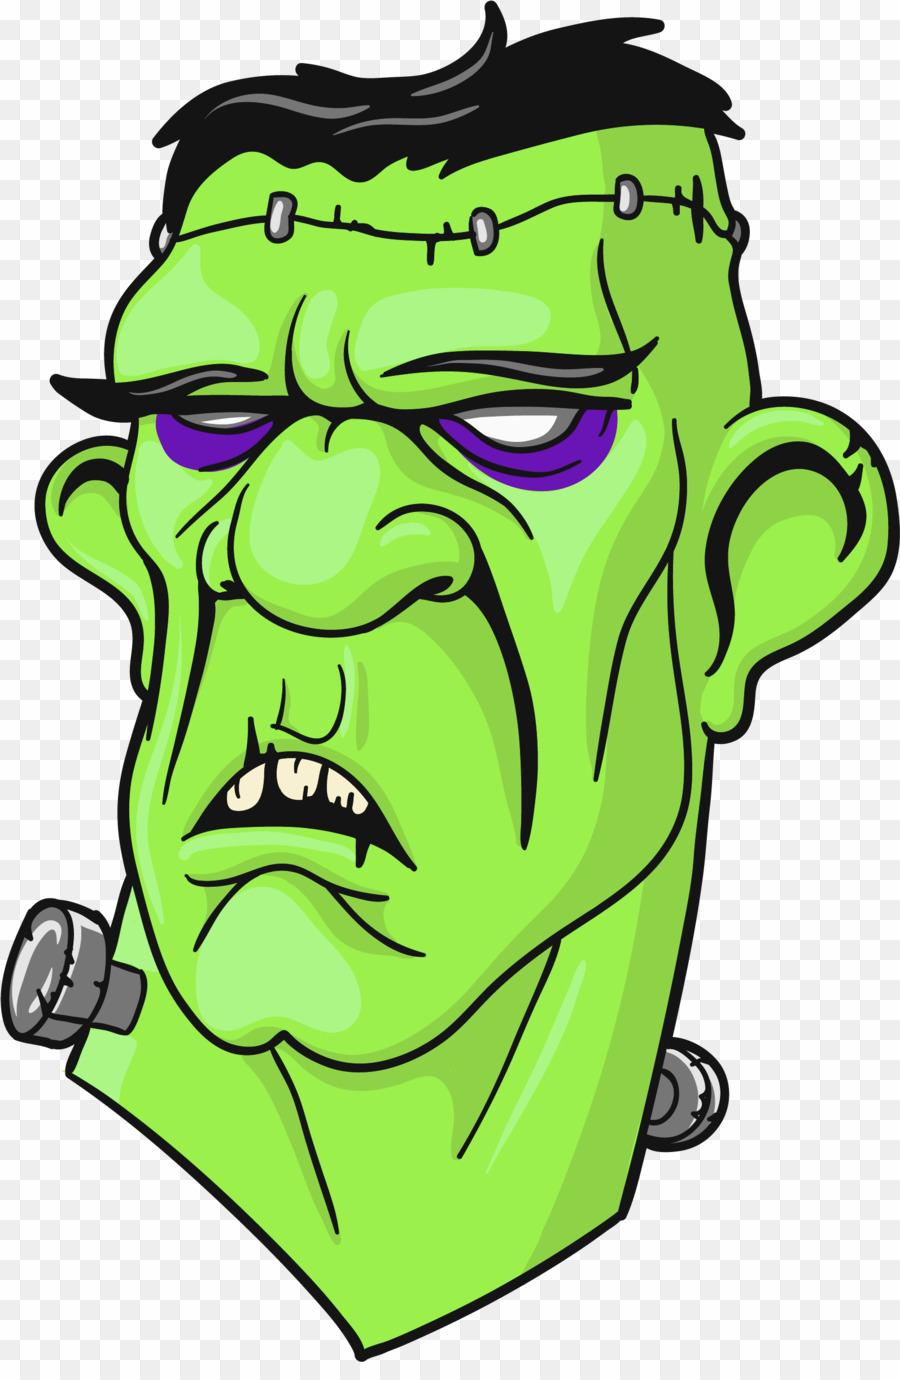 Frankenstein clipart frankenstein's. Head clip art png